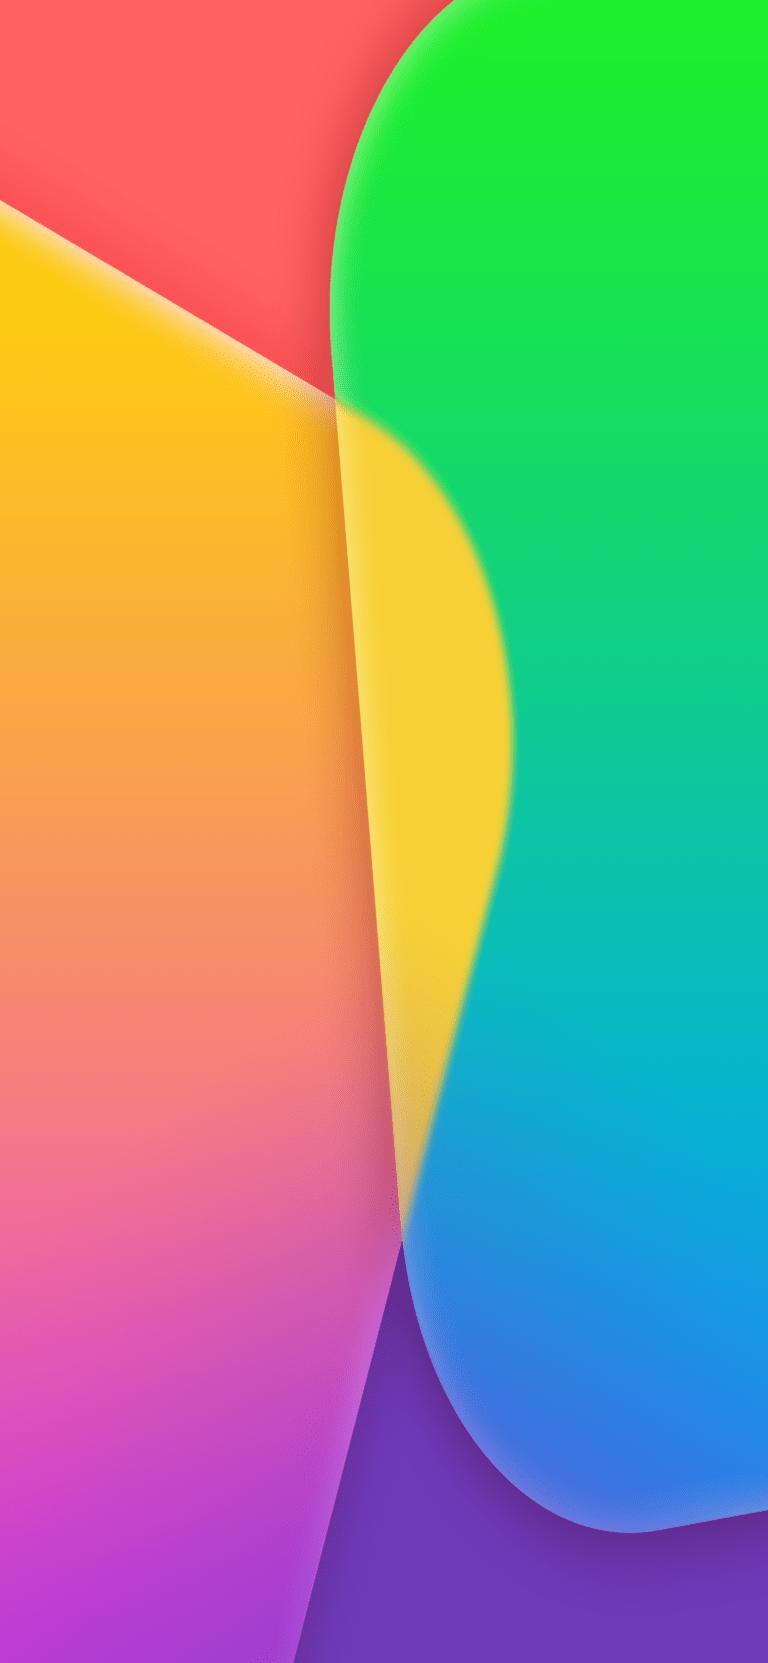 original iphone wallpapers